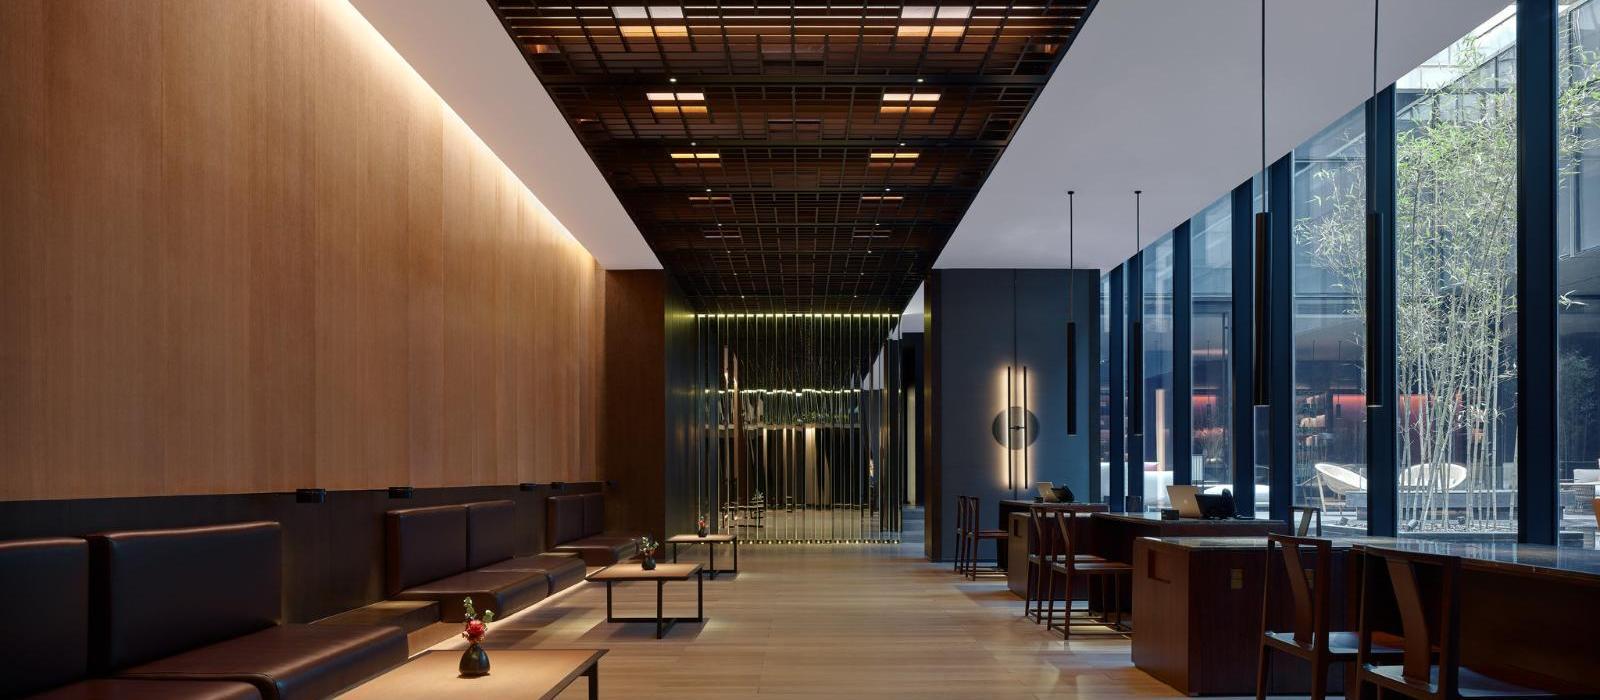 璞瑄酒店(The PuXuan Hotel & Spa) 圖片  www.533304.buzz